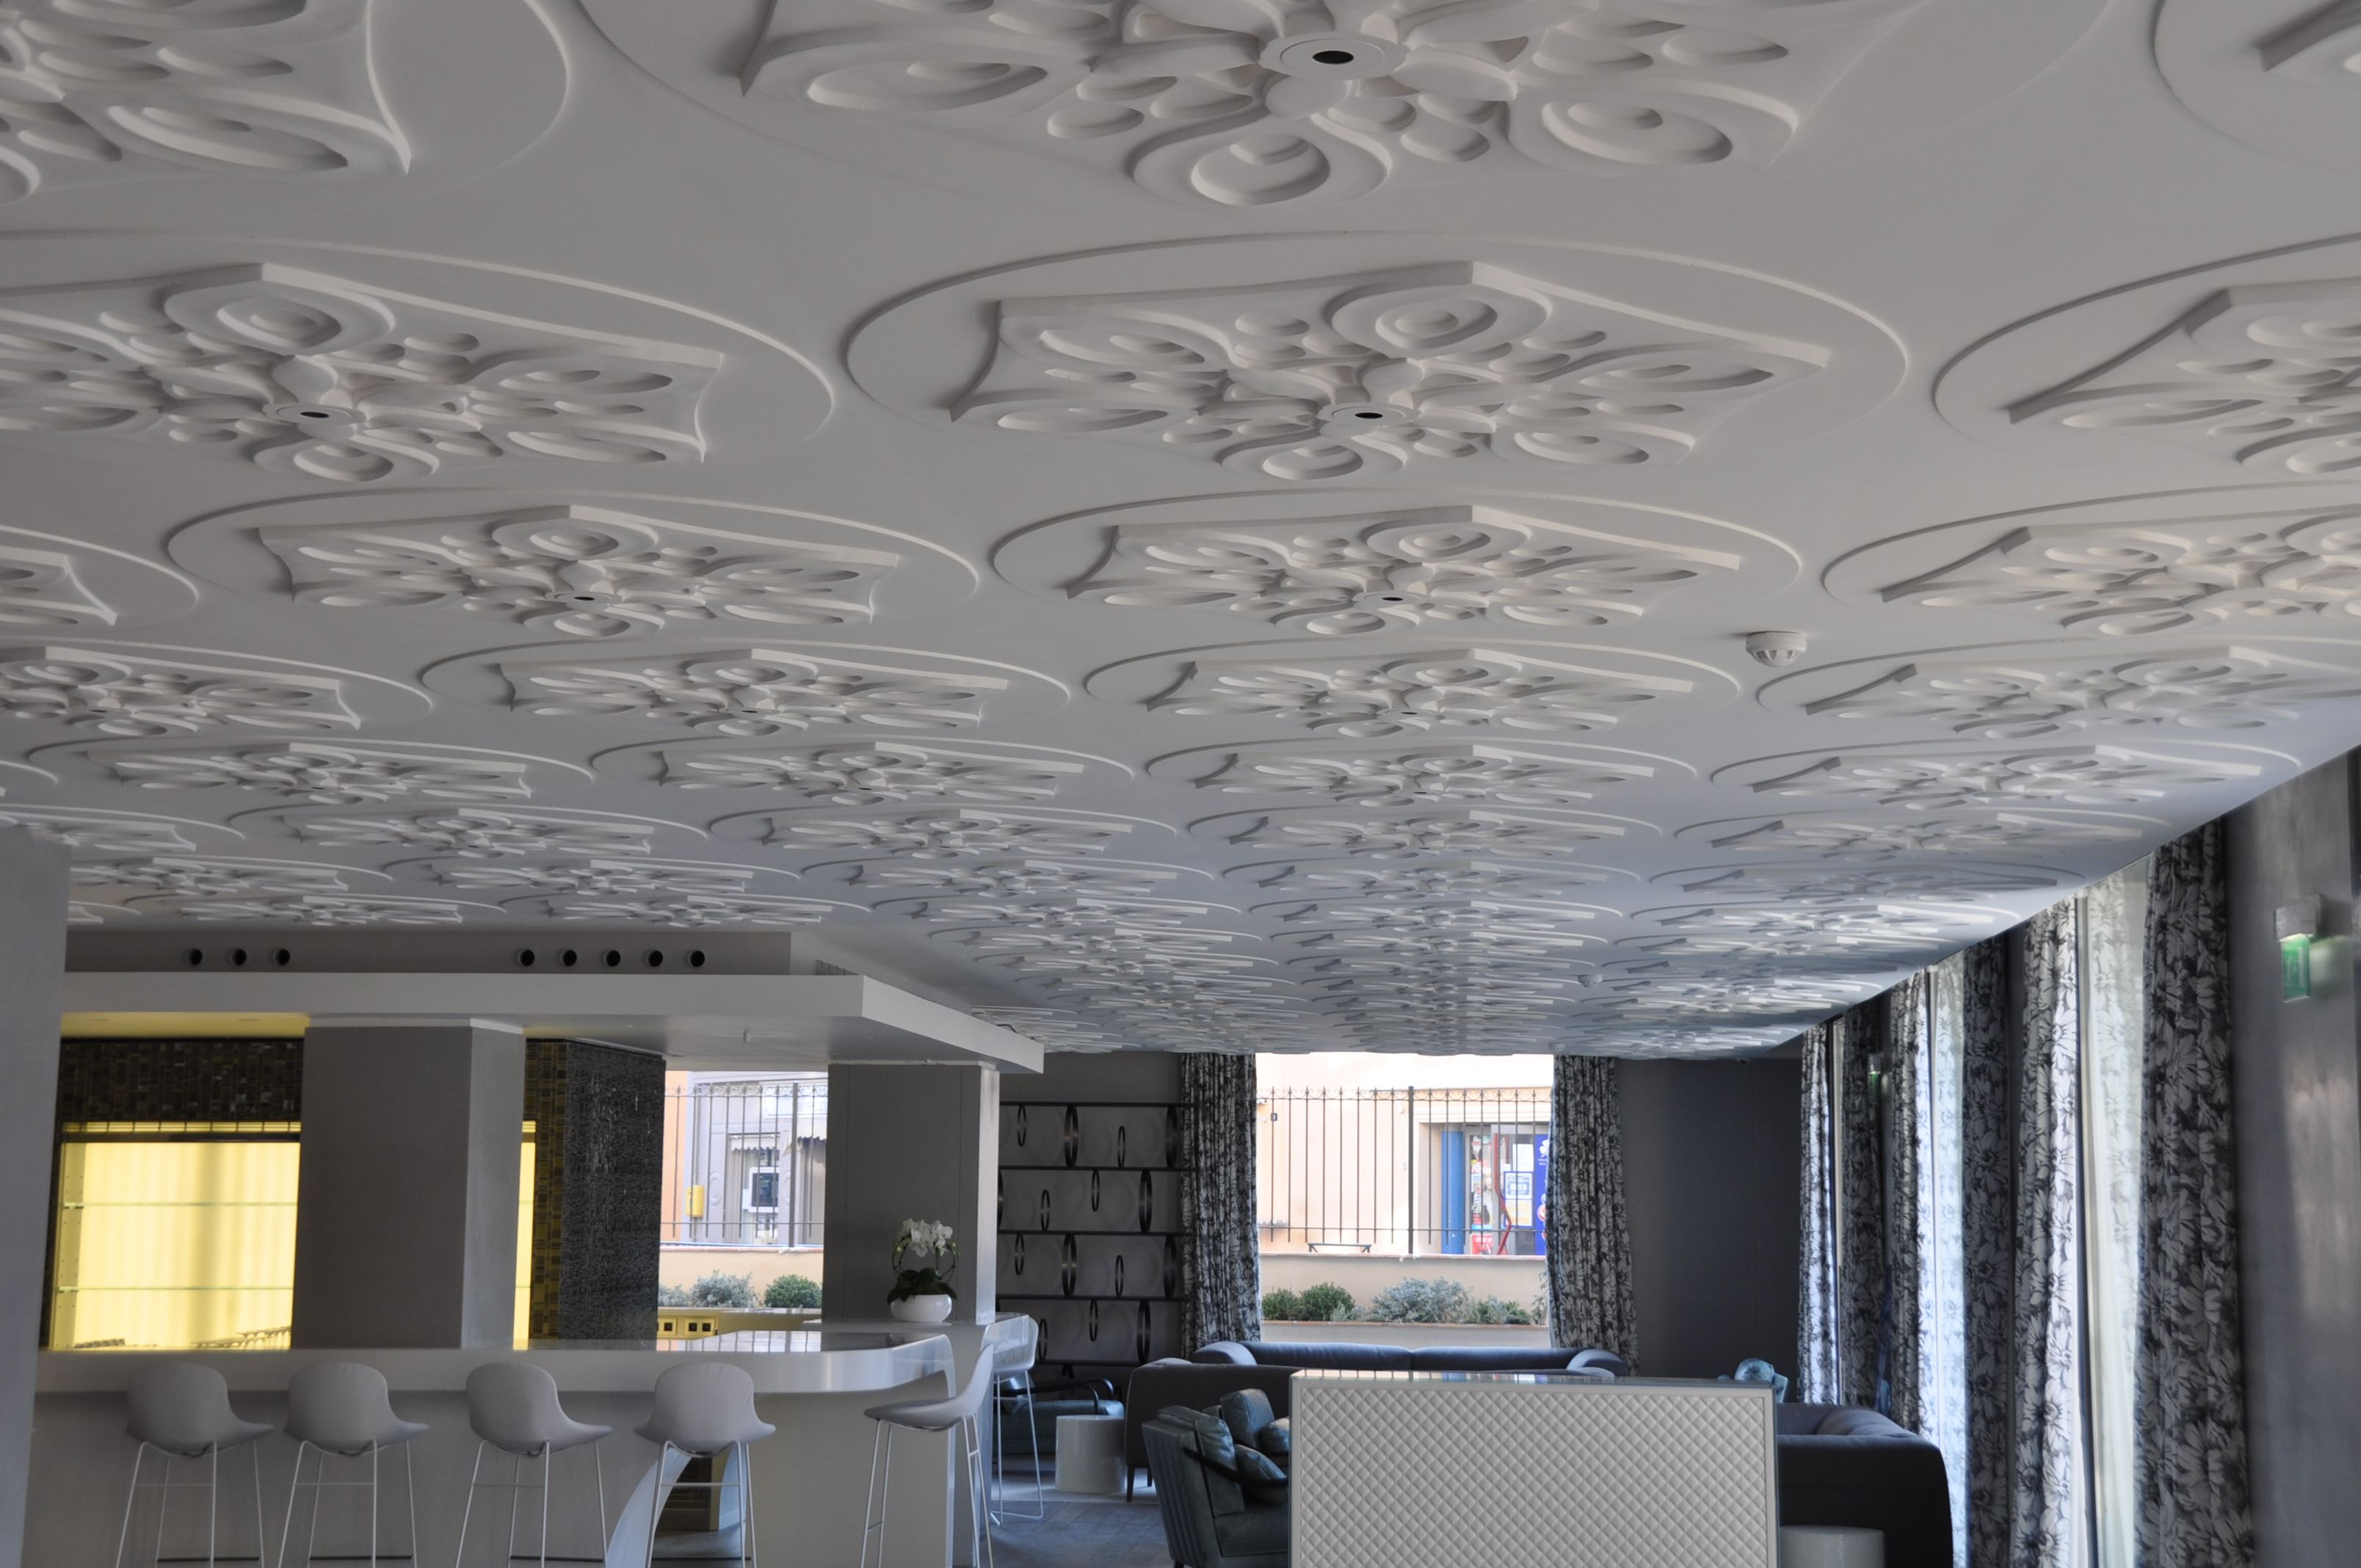 Plafond en staff hotel de paris saint tropez par staff d coration plafonds en staff - Hotel miroir plafond paris ...